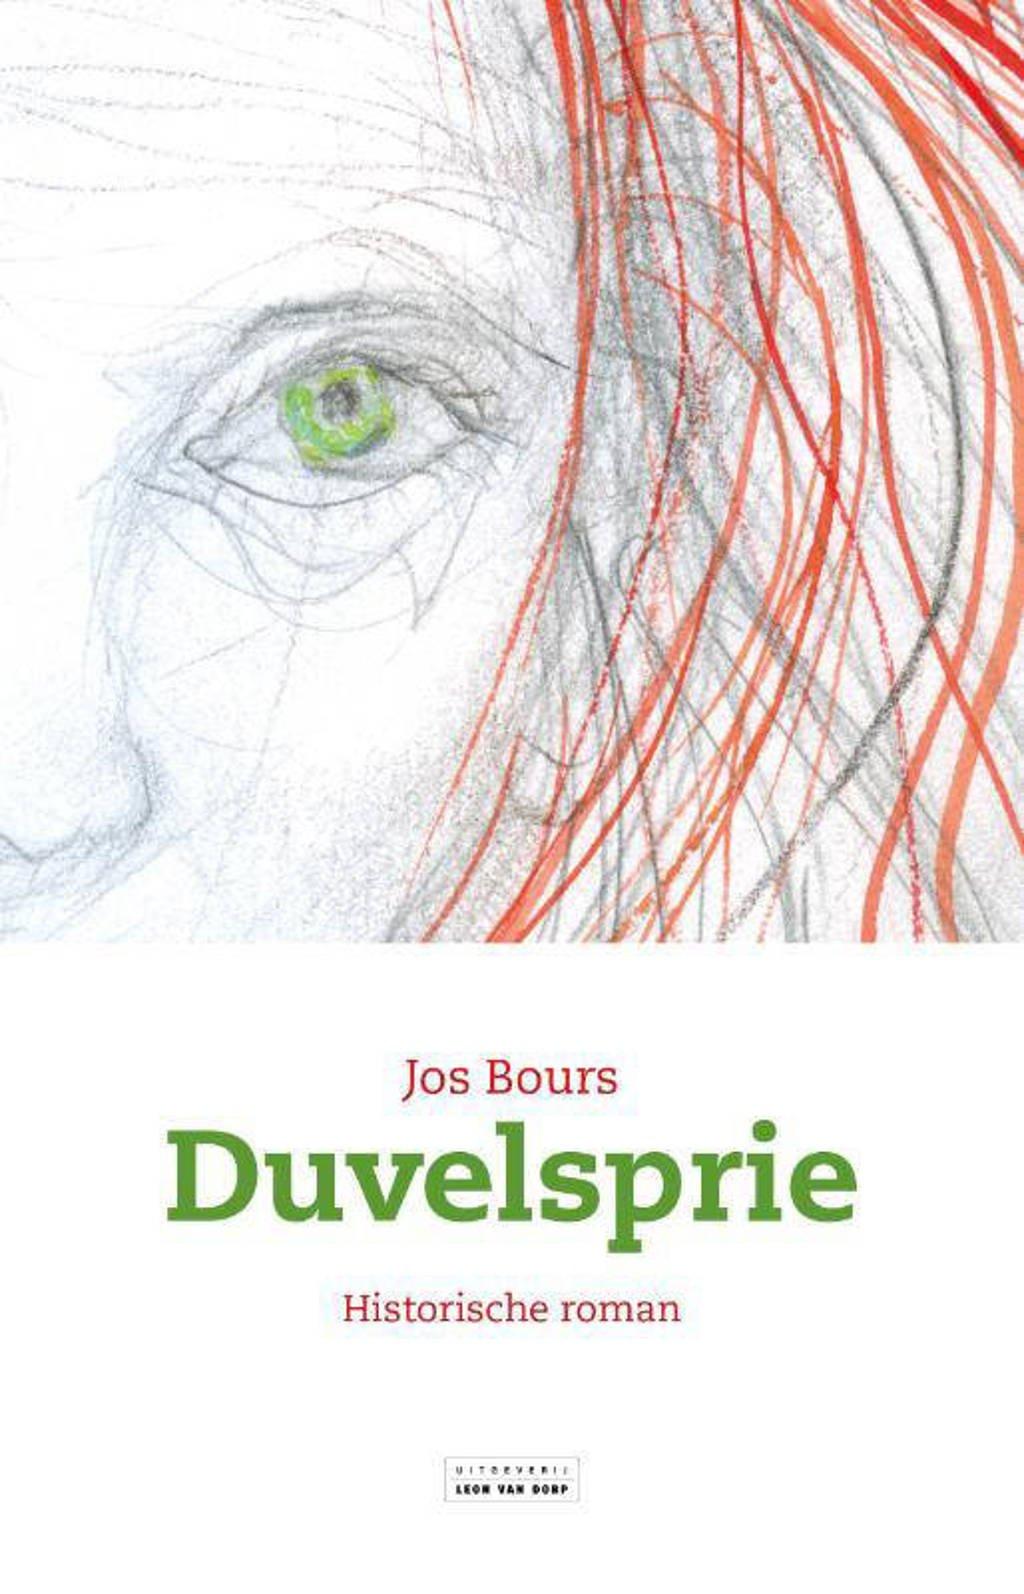 Duvelsprie - Jos Bours